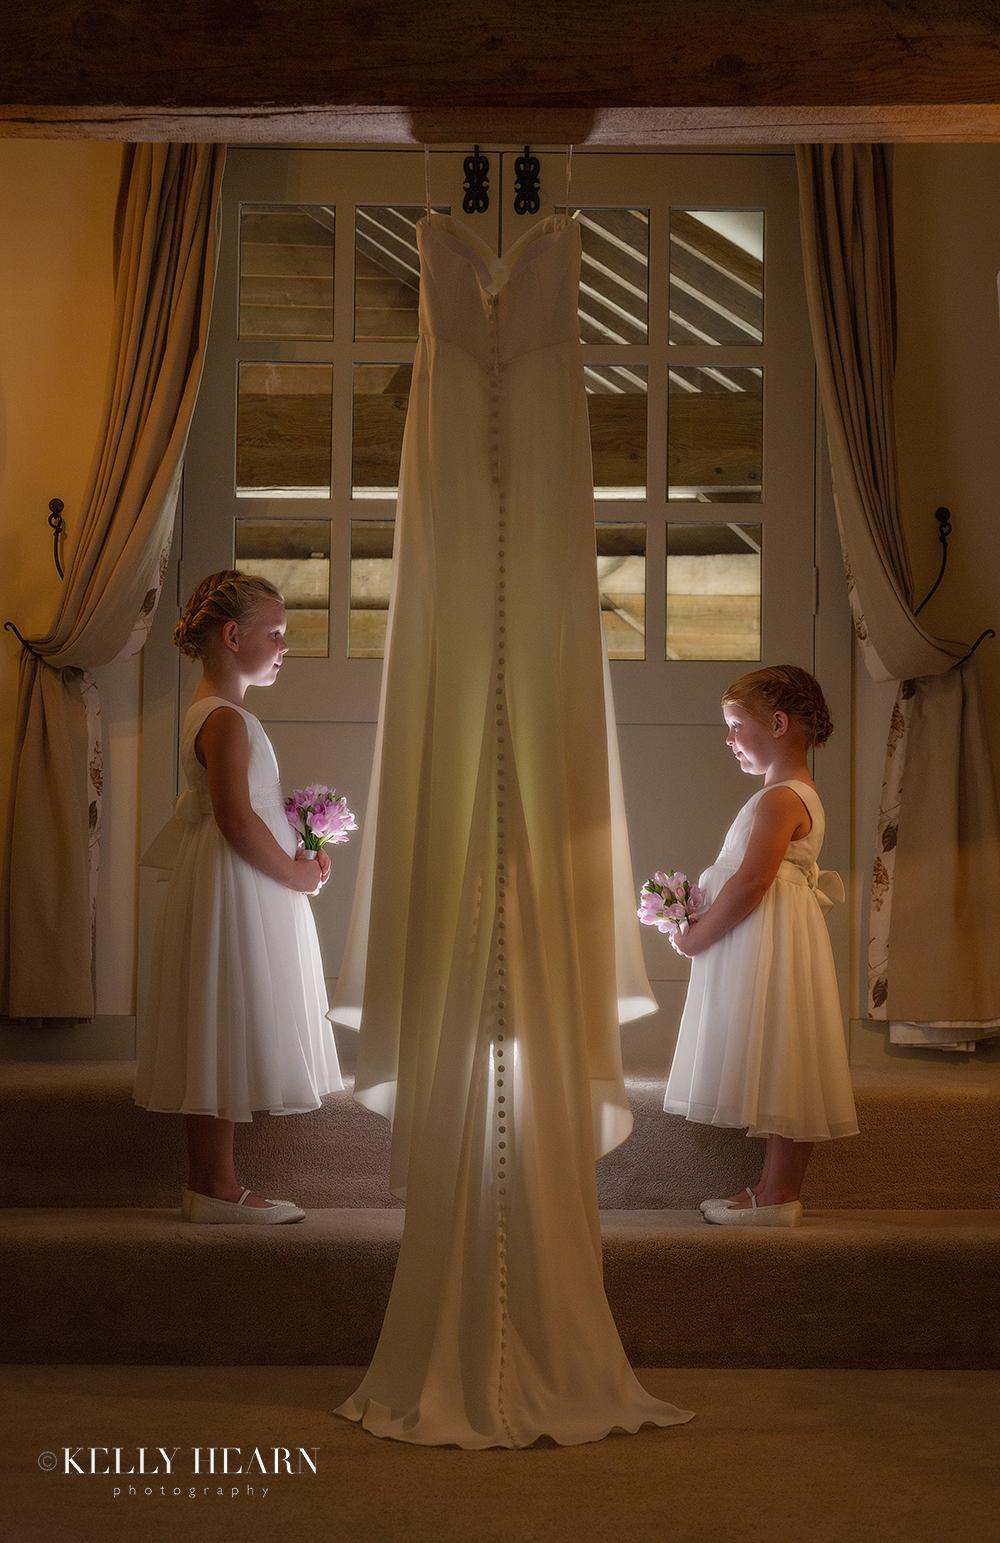 GRE_brides-dress-by-window.jpg#asset:2702